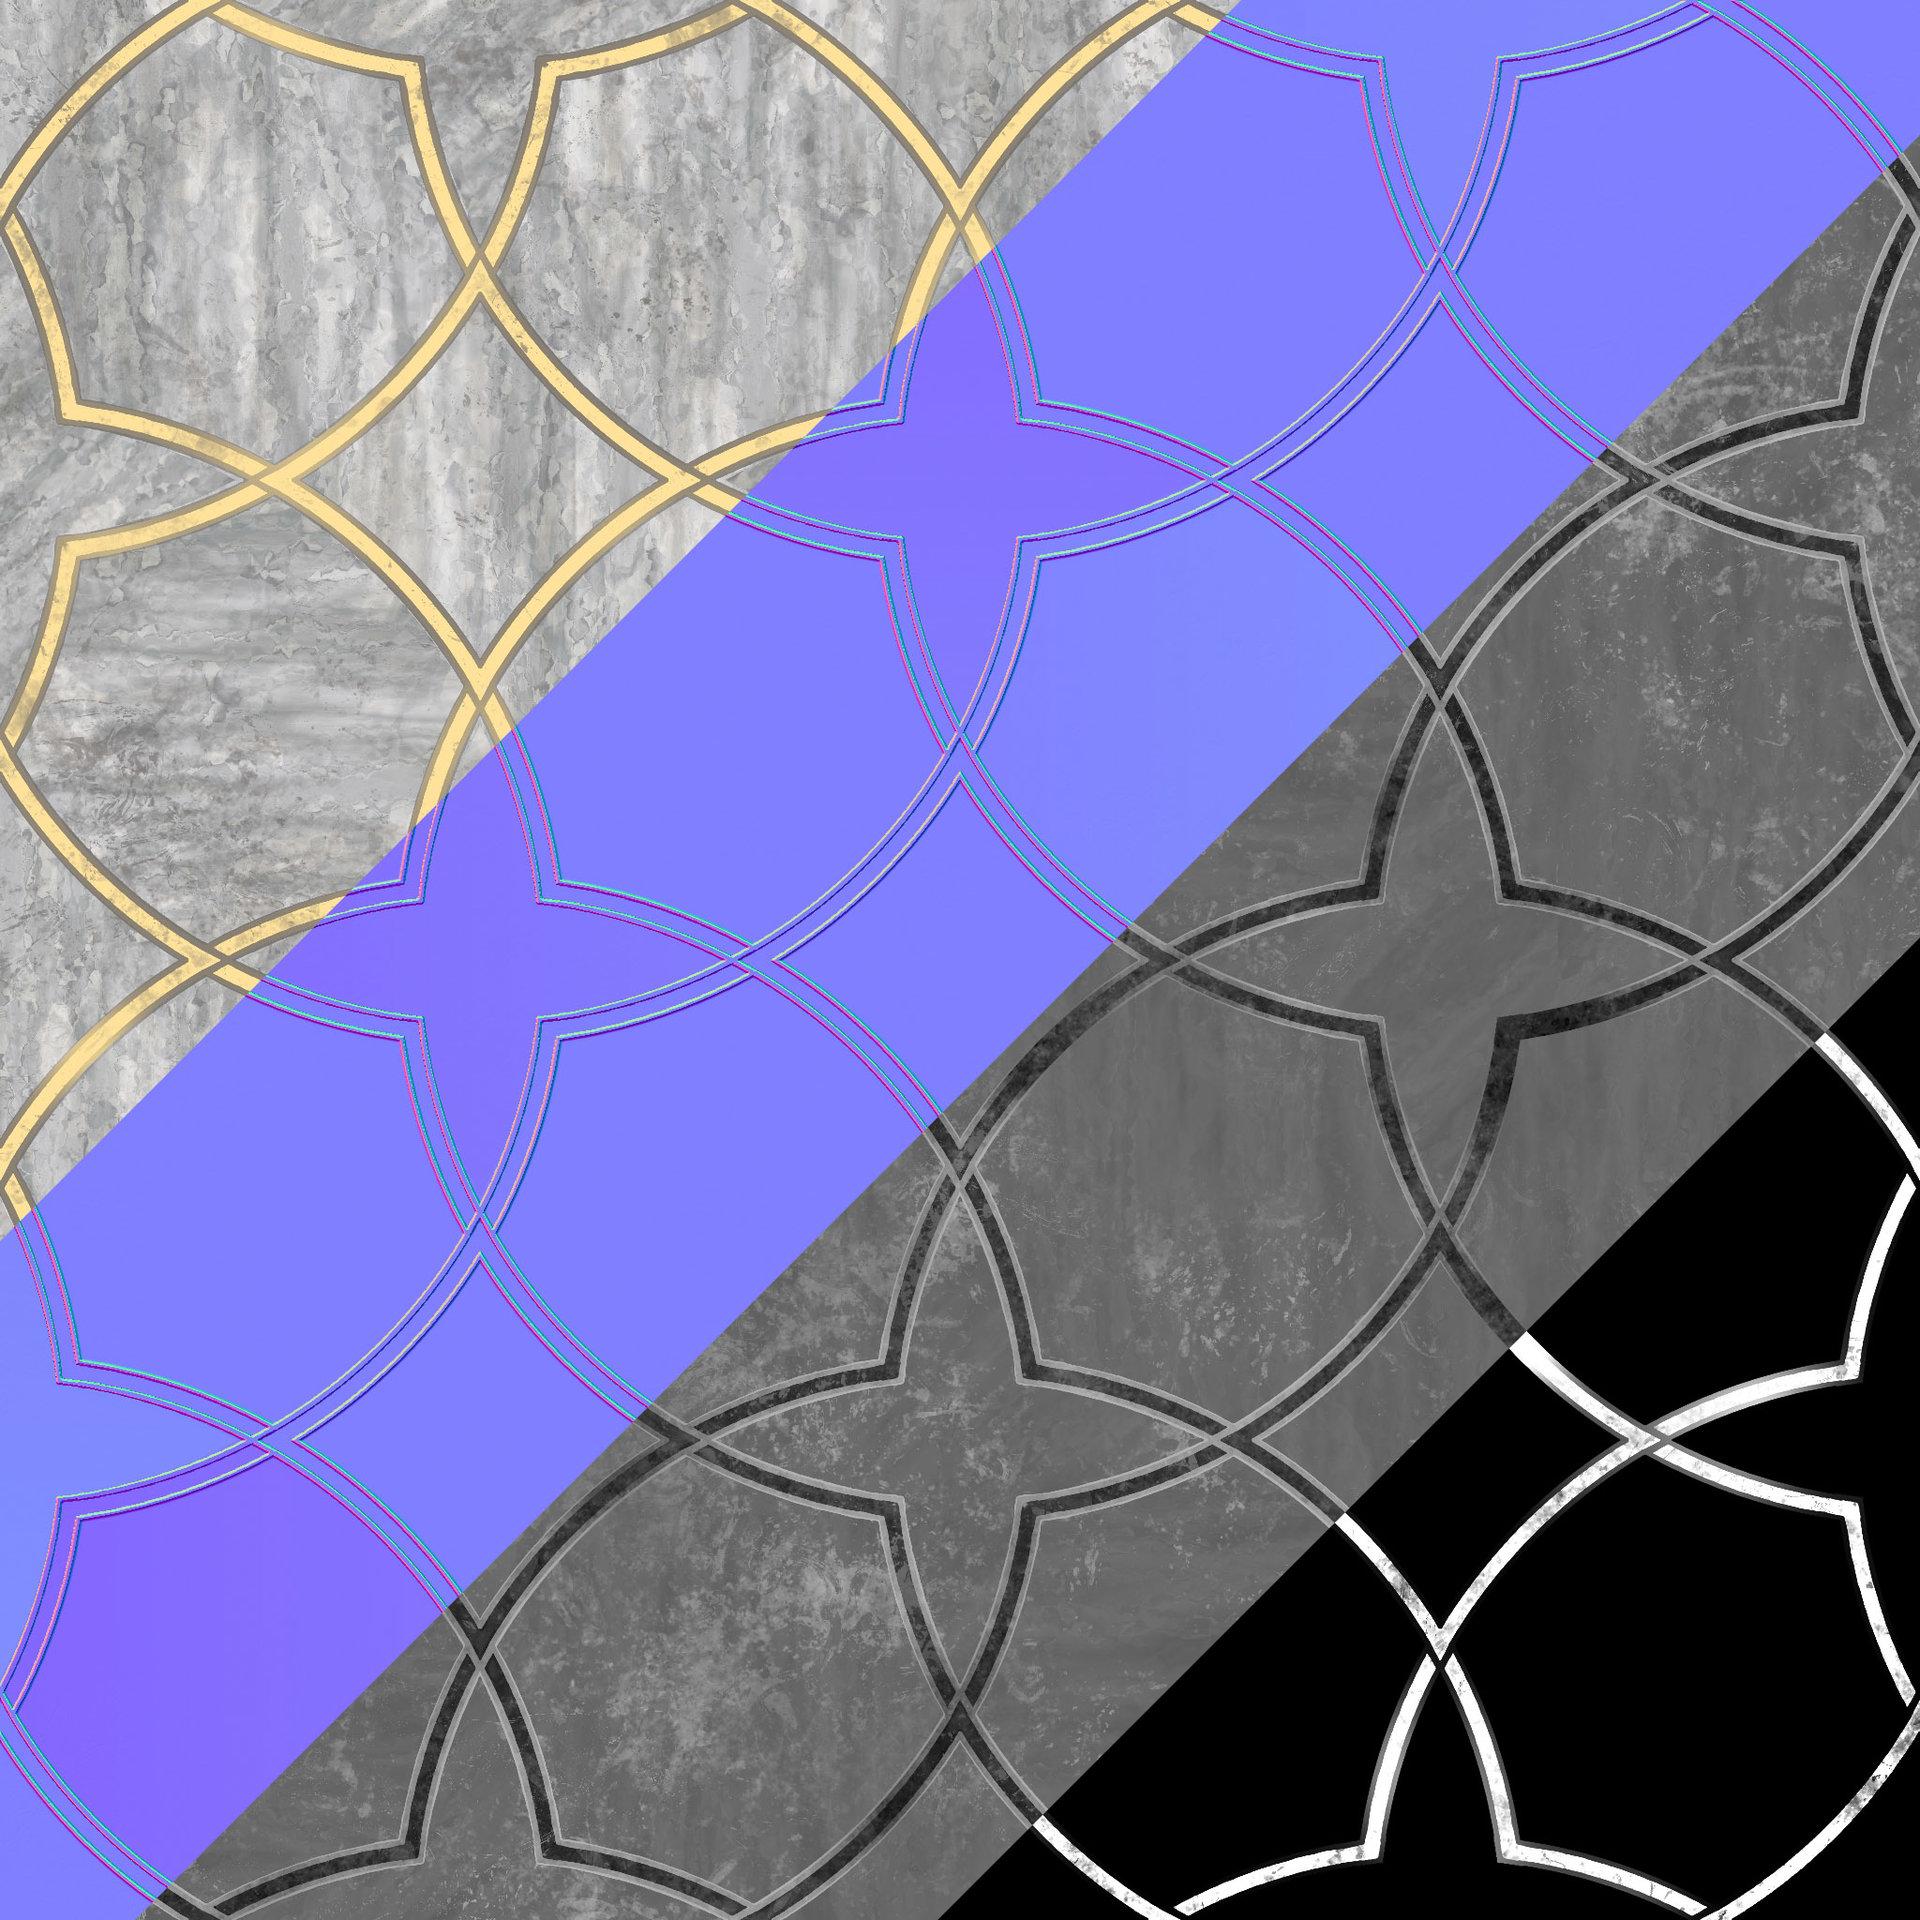 Stevans robert ornatedmarble textures